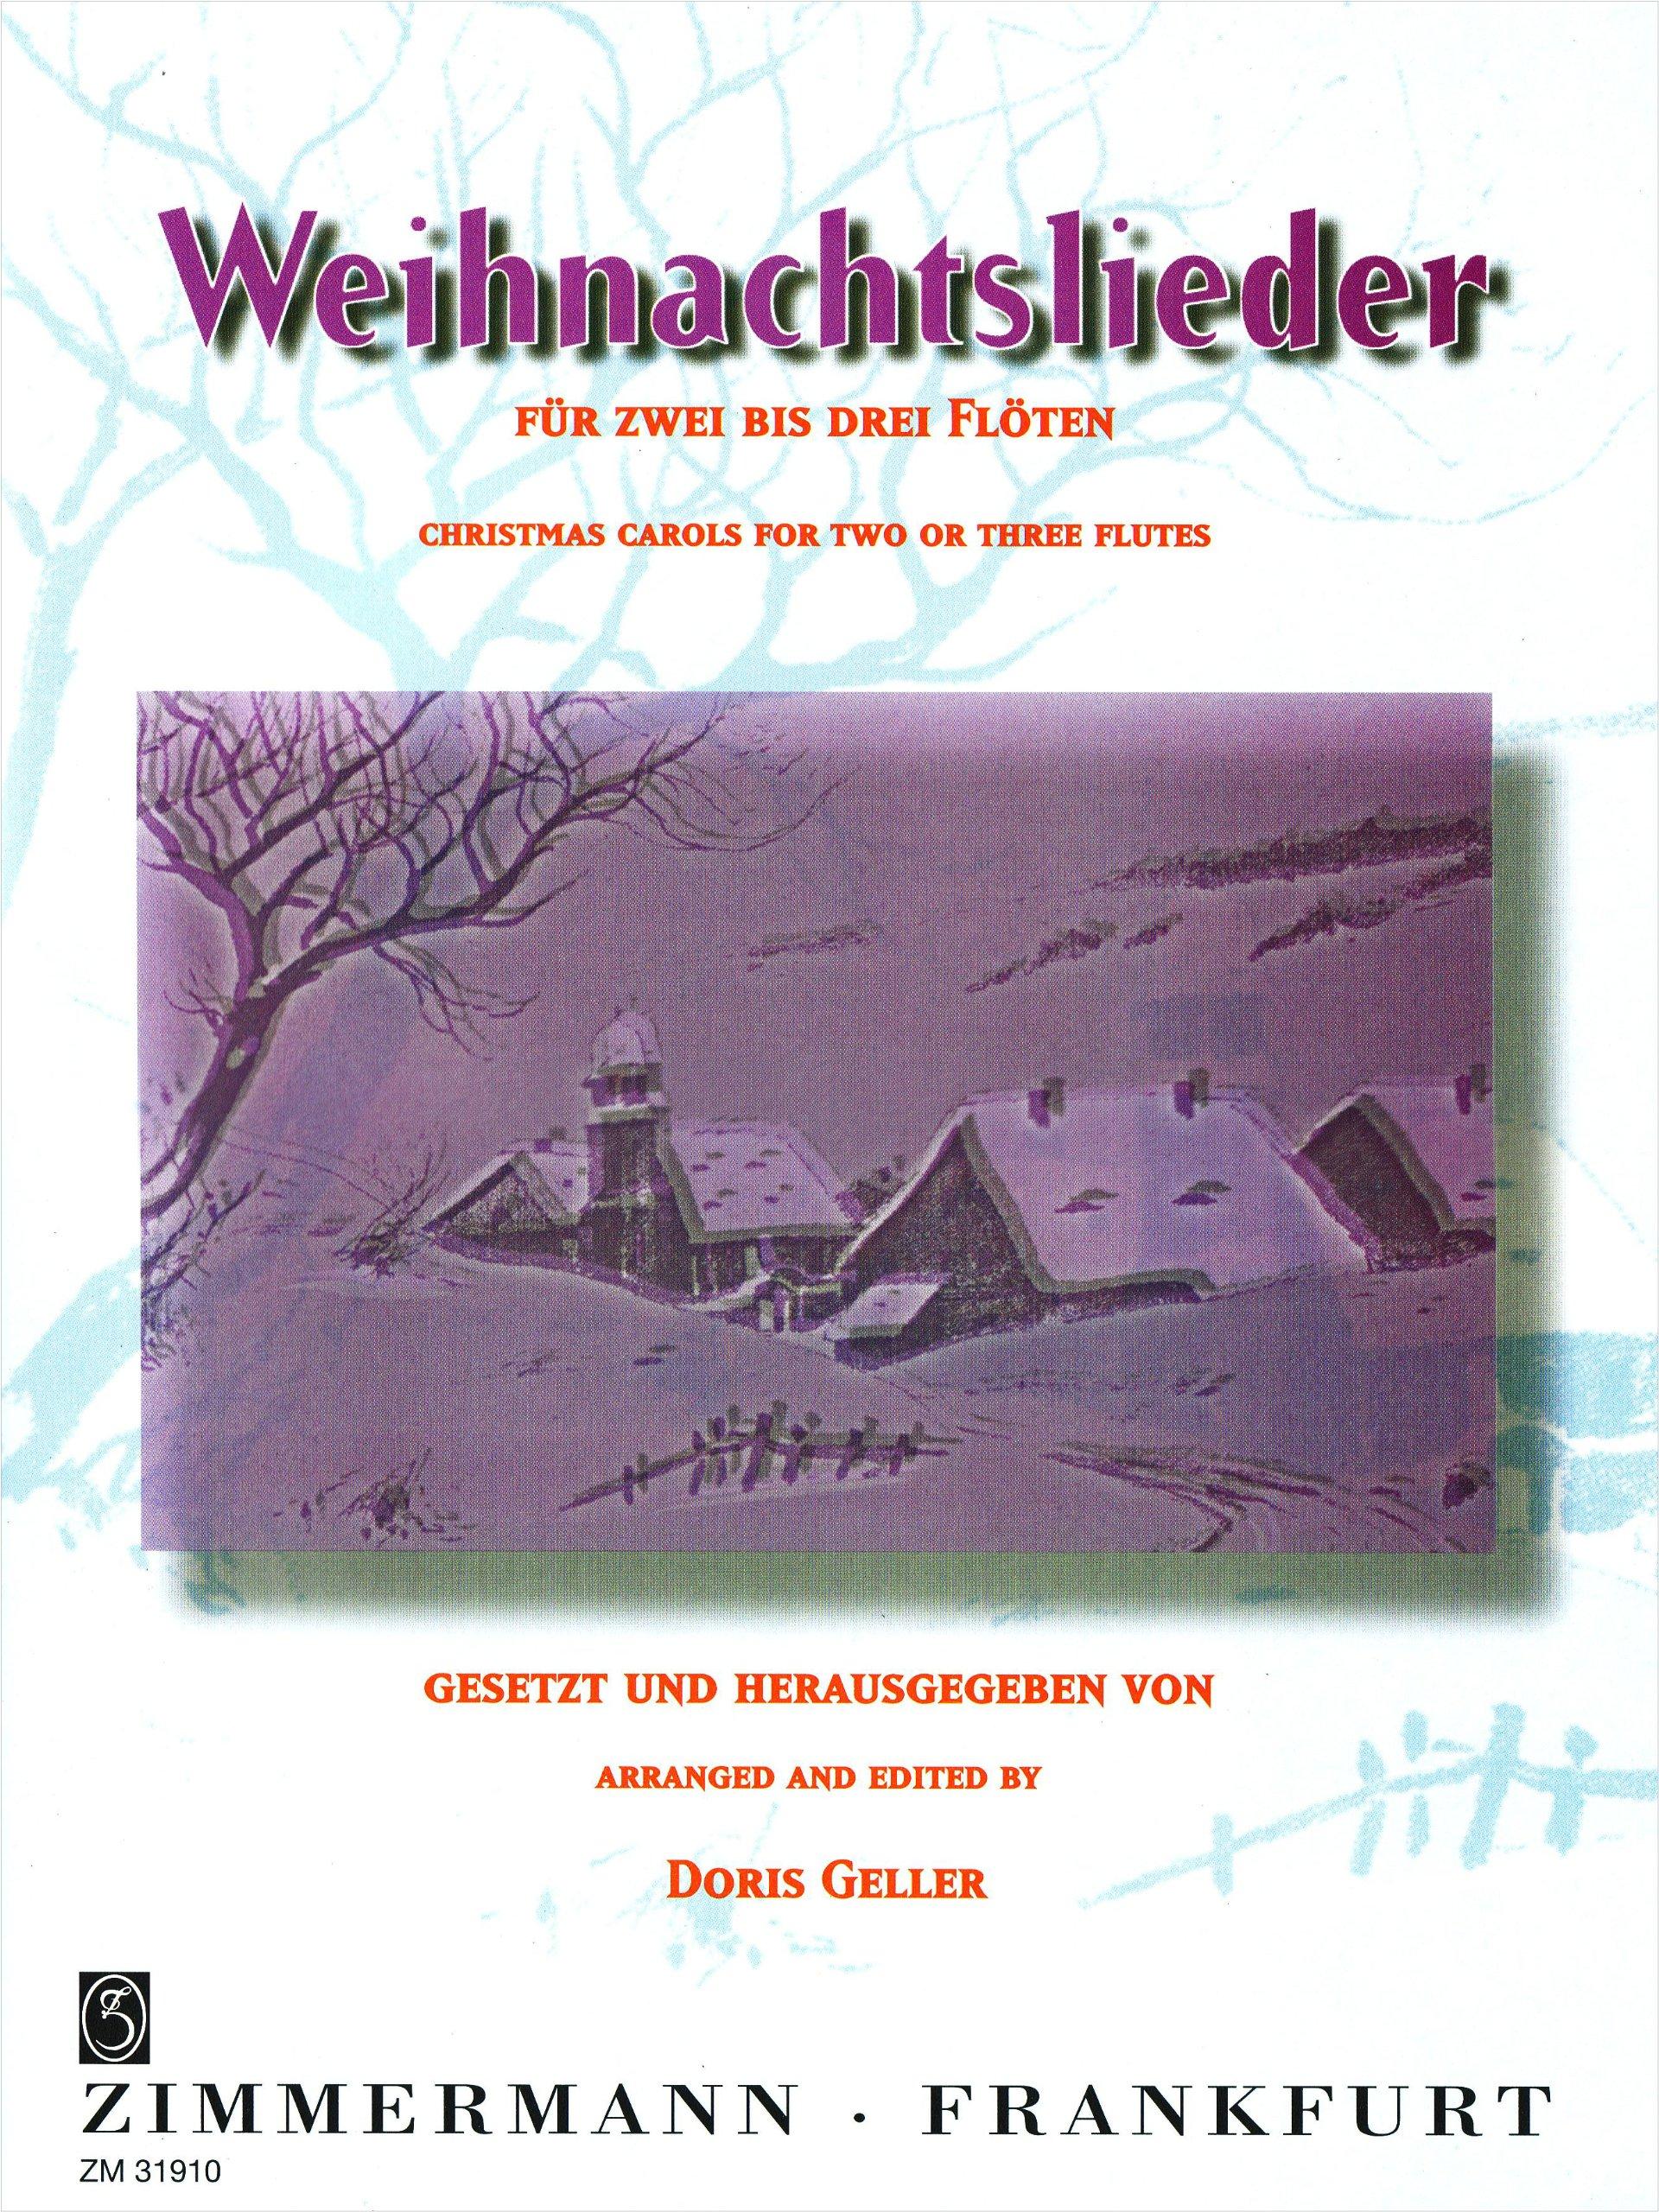 Weihnachtslieder: 2-3 Flöten 3. Flöte ad libitum .: Amazon.de: Doris ...